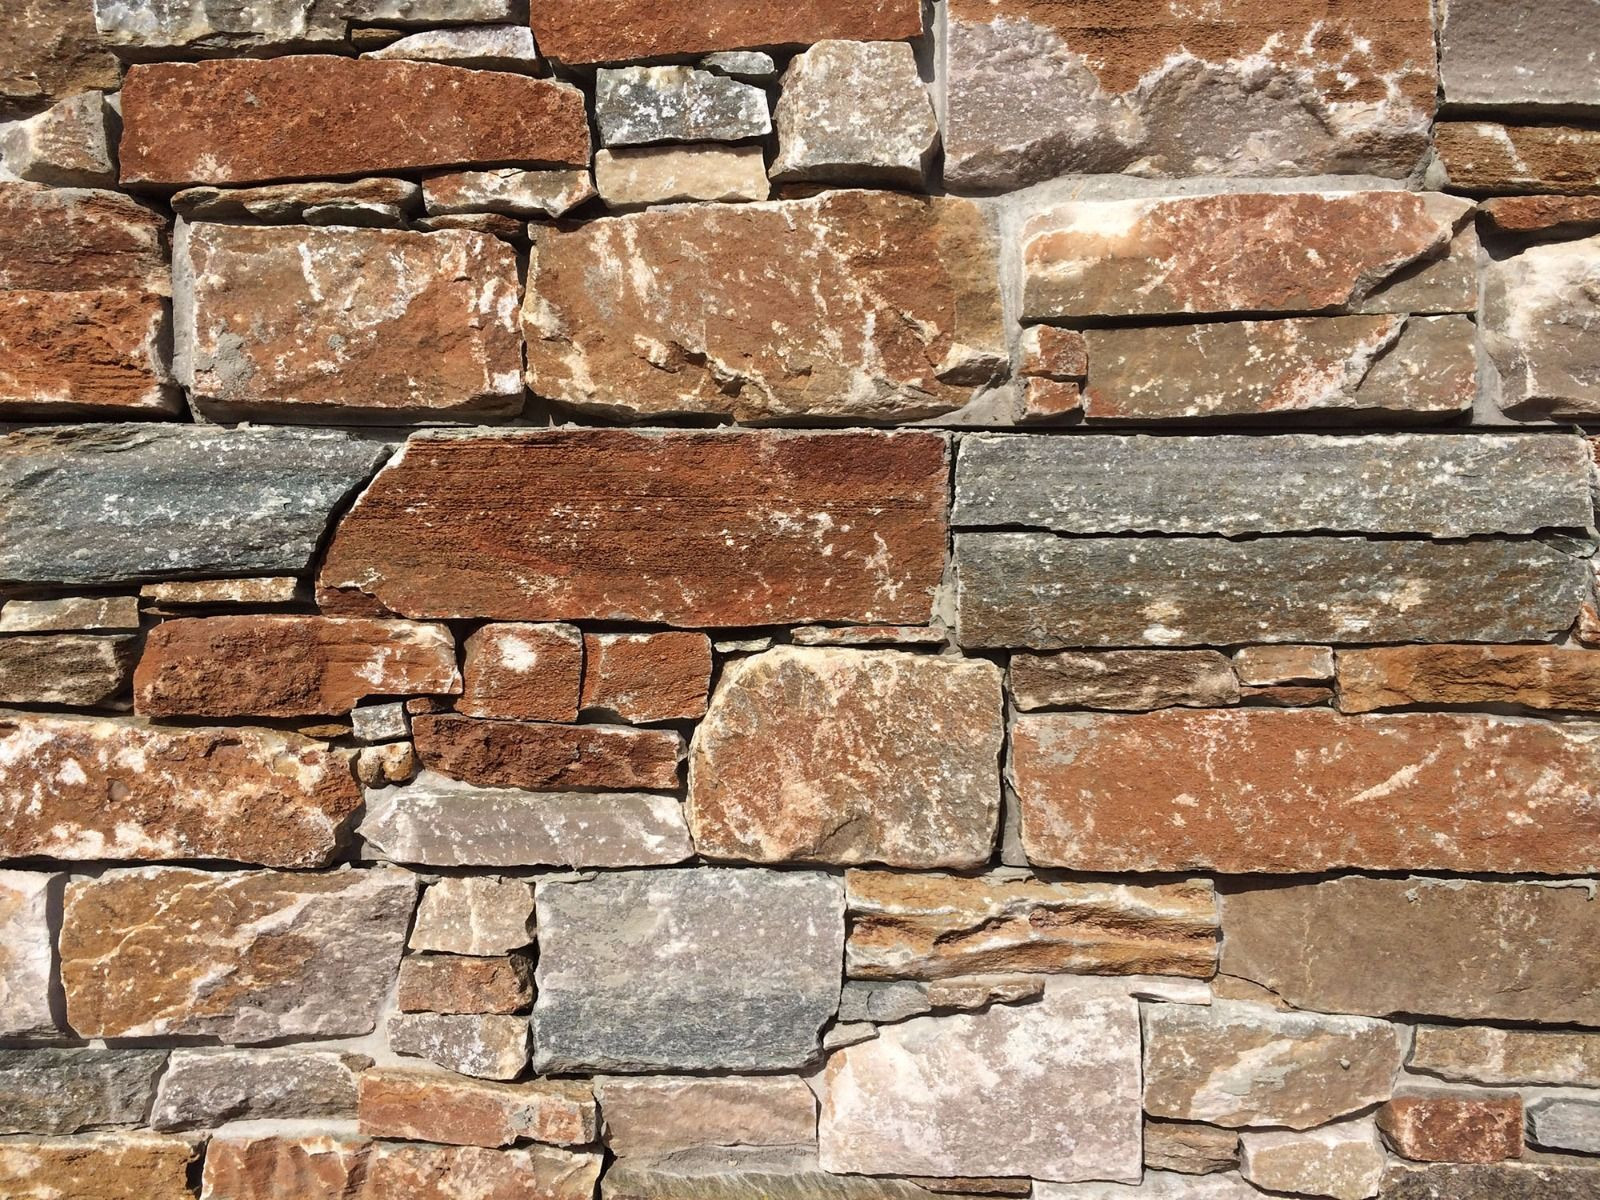 Quartz Natural Stone Cladding Panel Per Box (0.33m2 Per Box)